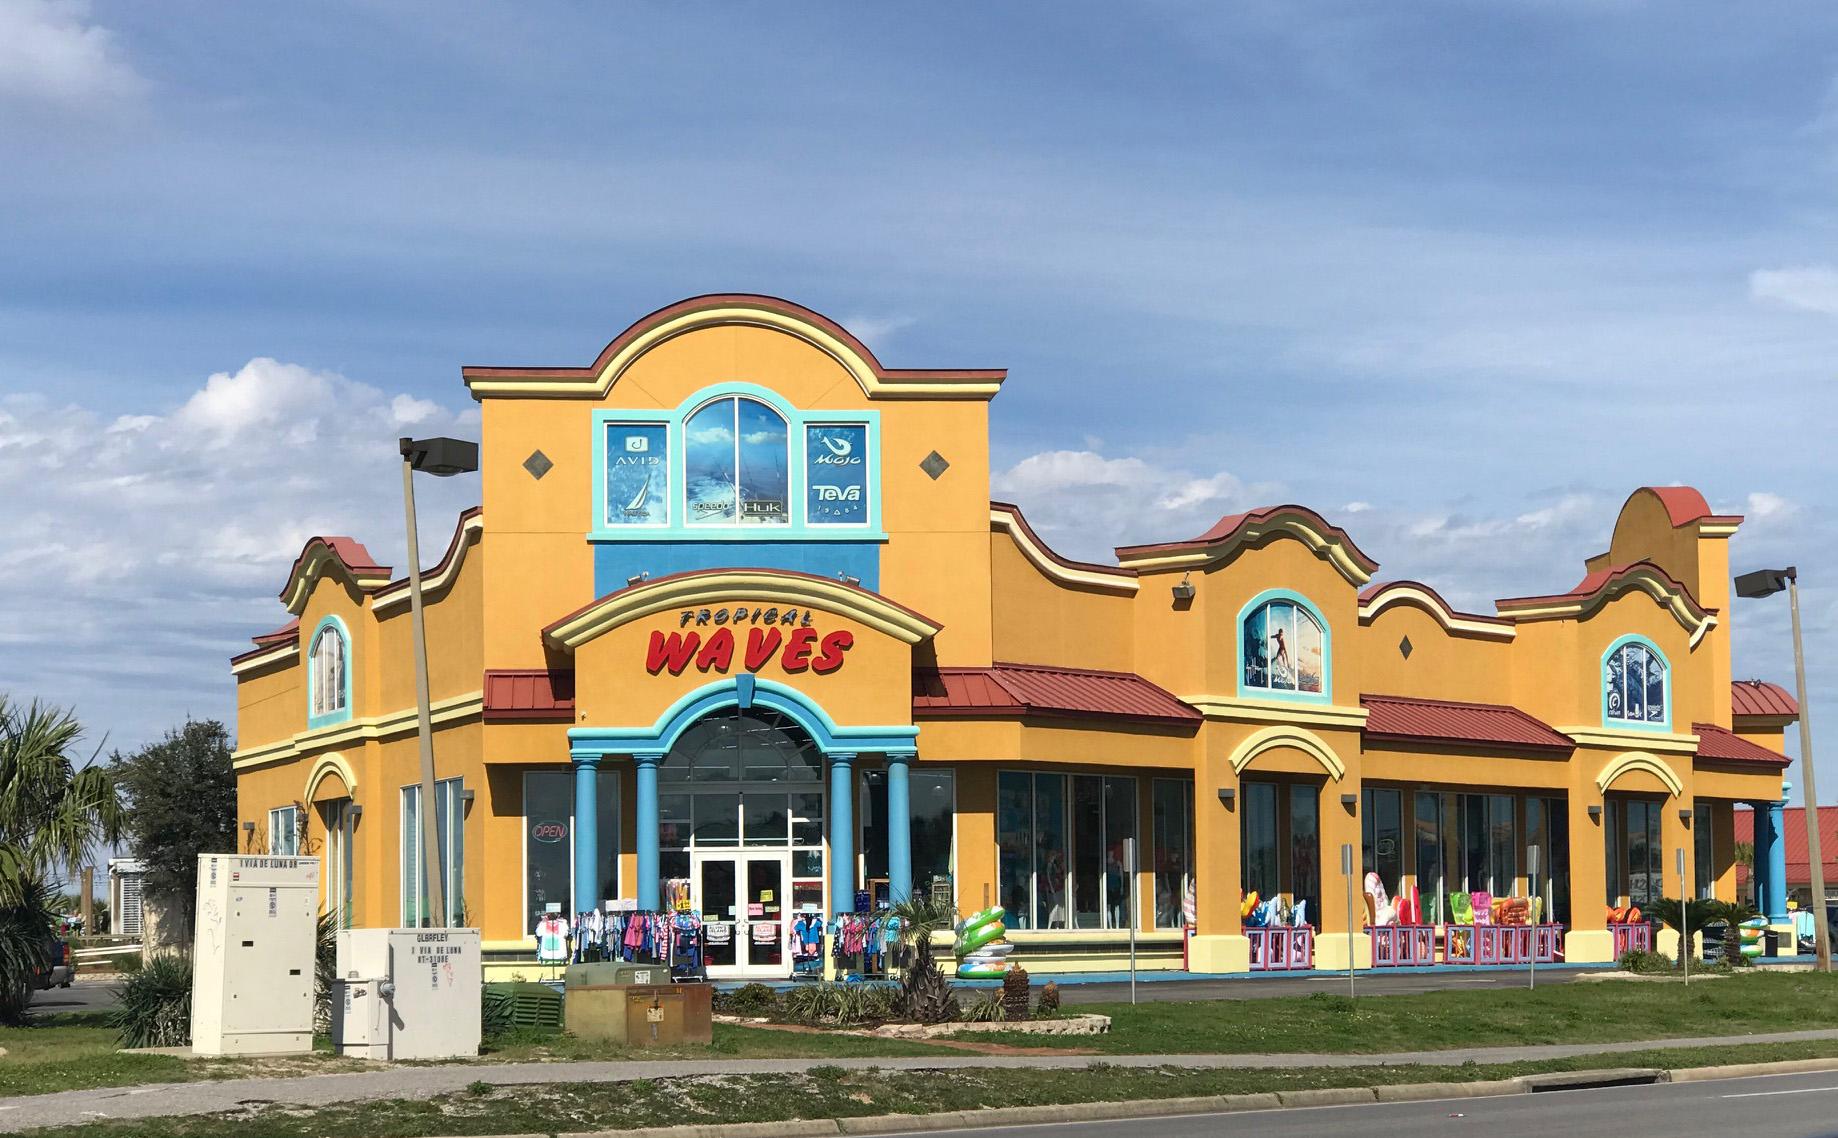 Emerald Isle #1105 Condo rental in Emerald Isle Pensacola Beach in Pensacola Beach Florida - #49